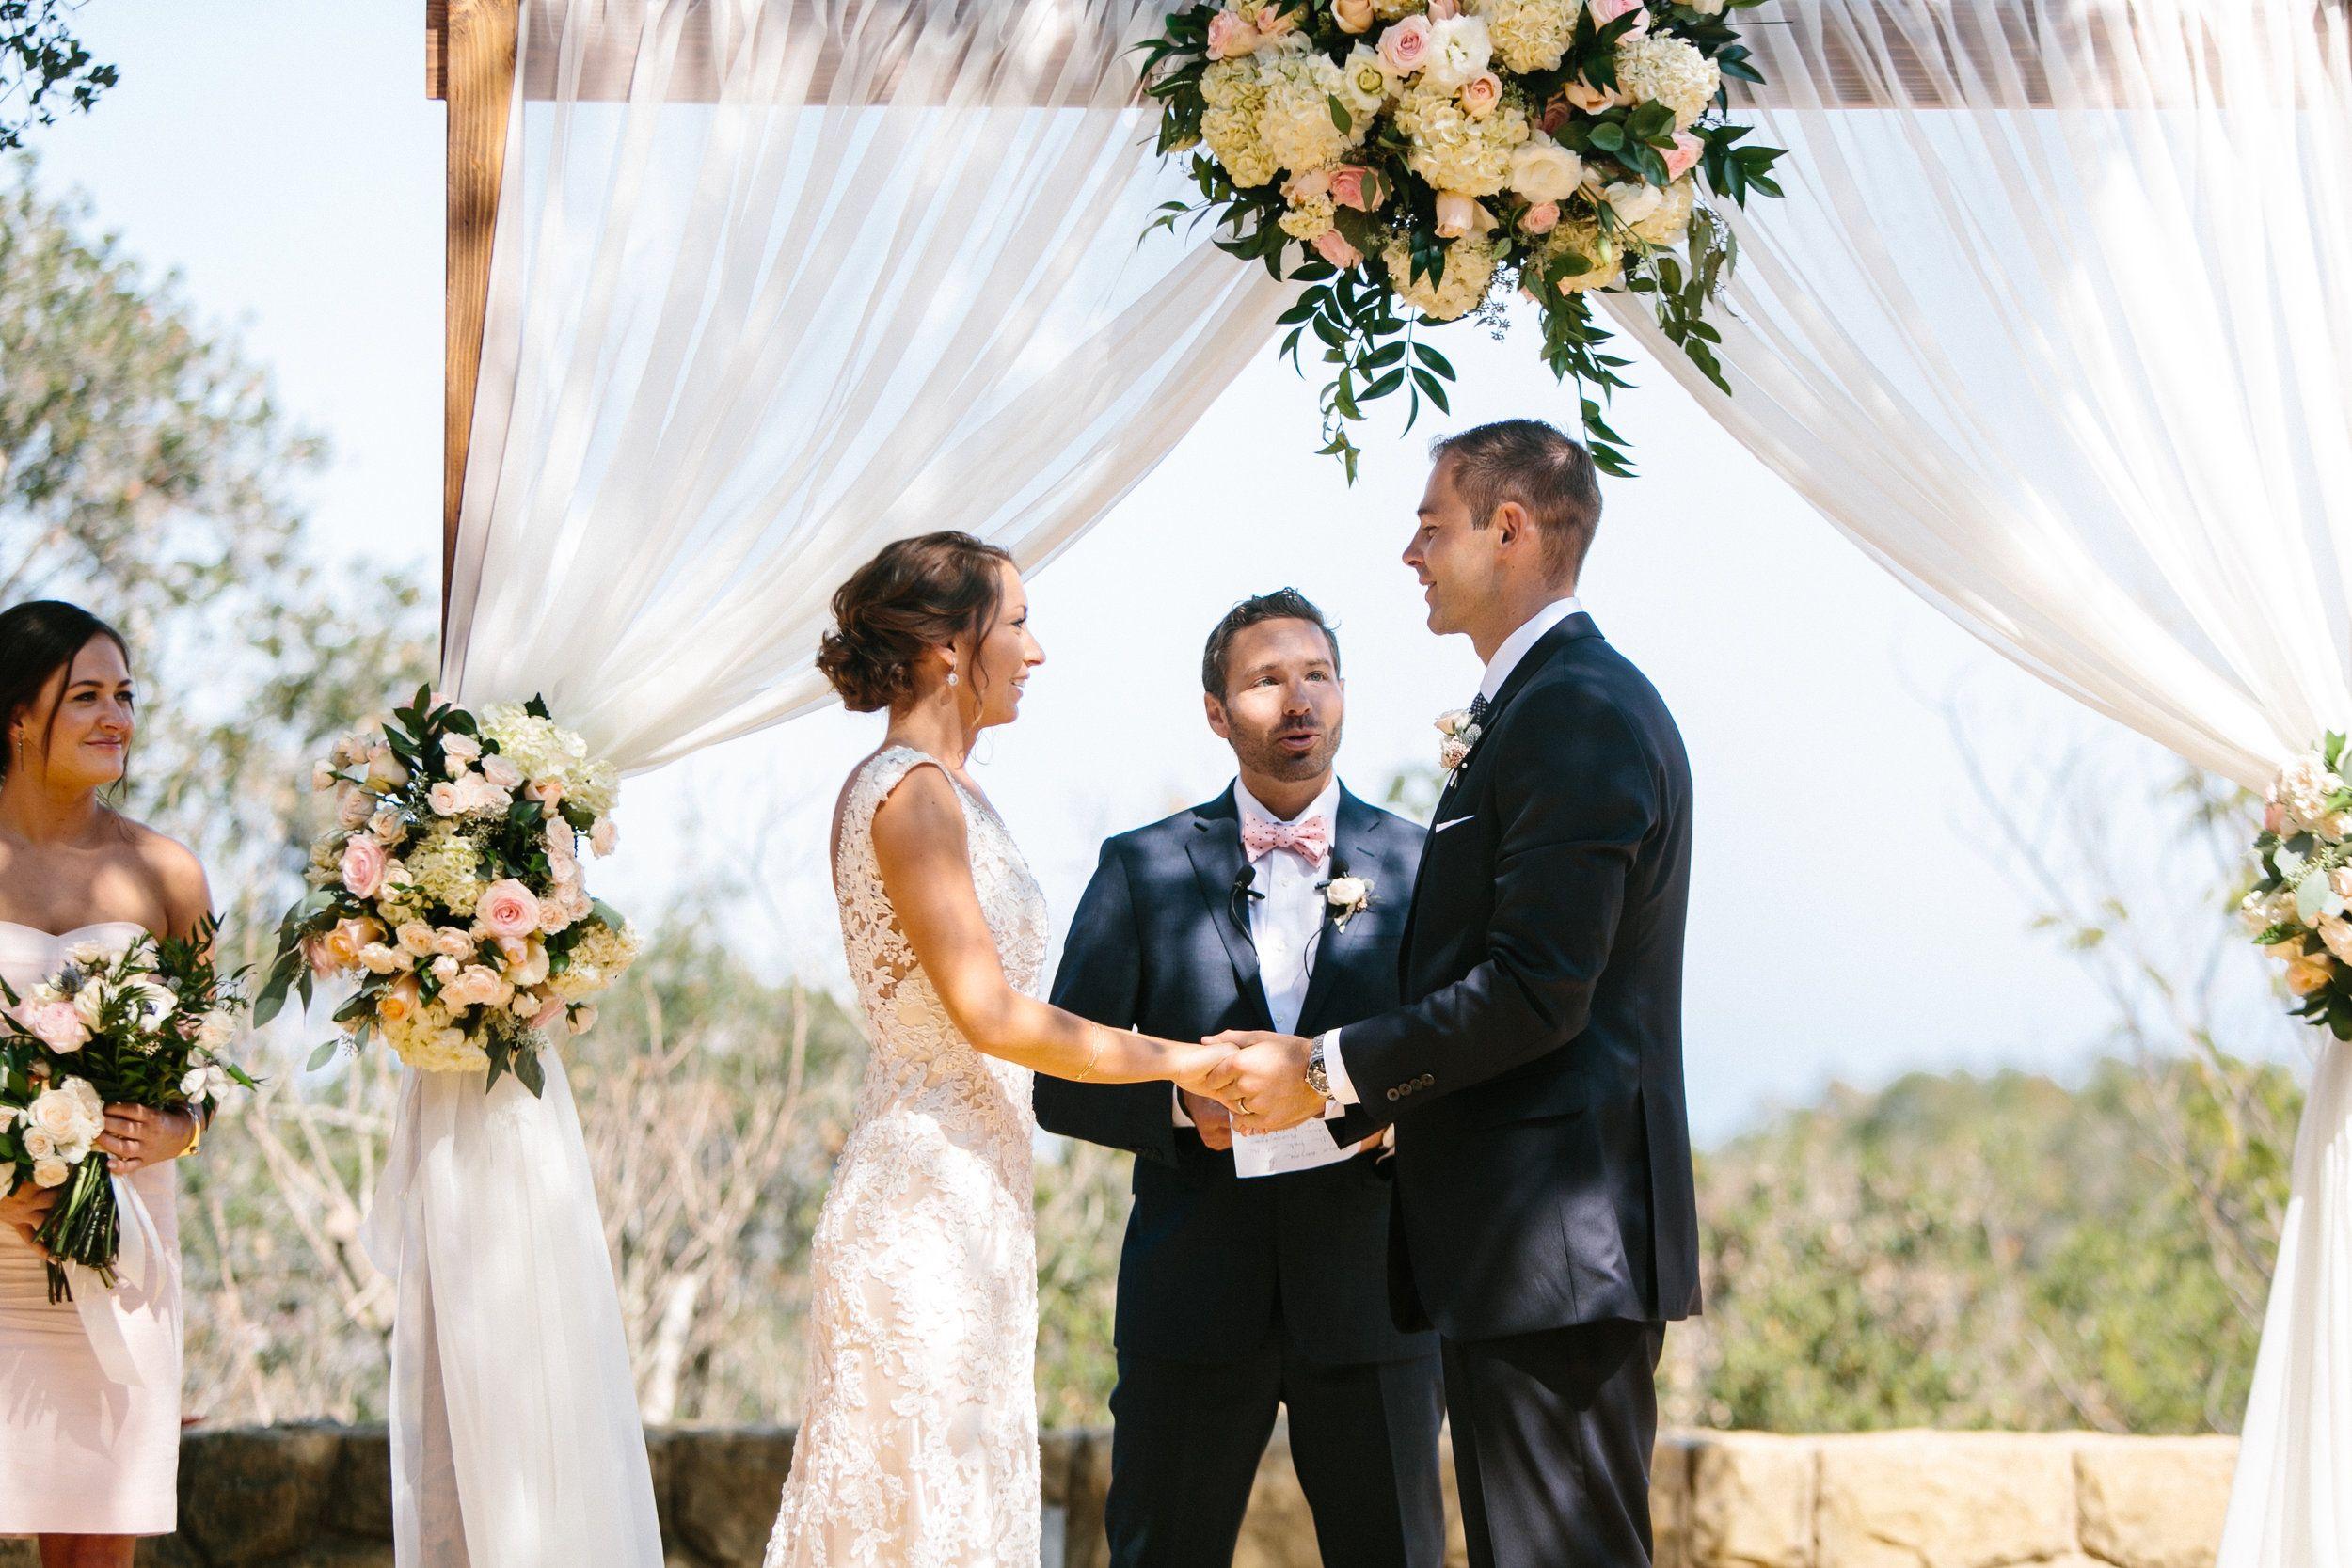 Burlap Bordeaux Featured In Santa Barbara Wedding Style Venue Elings Park Photographer Josh Newton Planner Designer